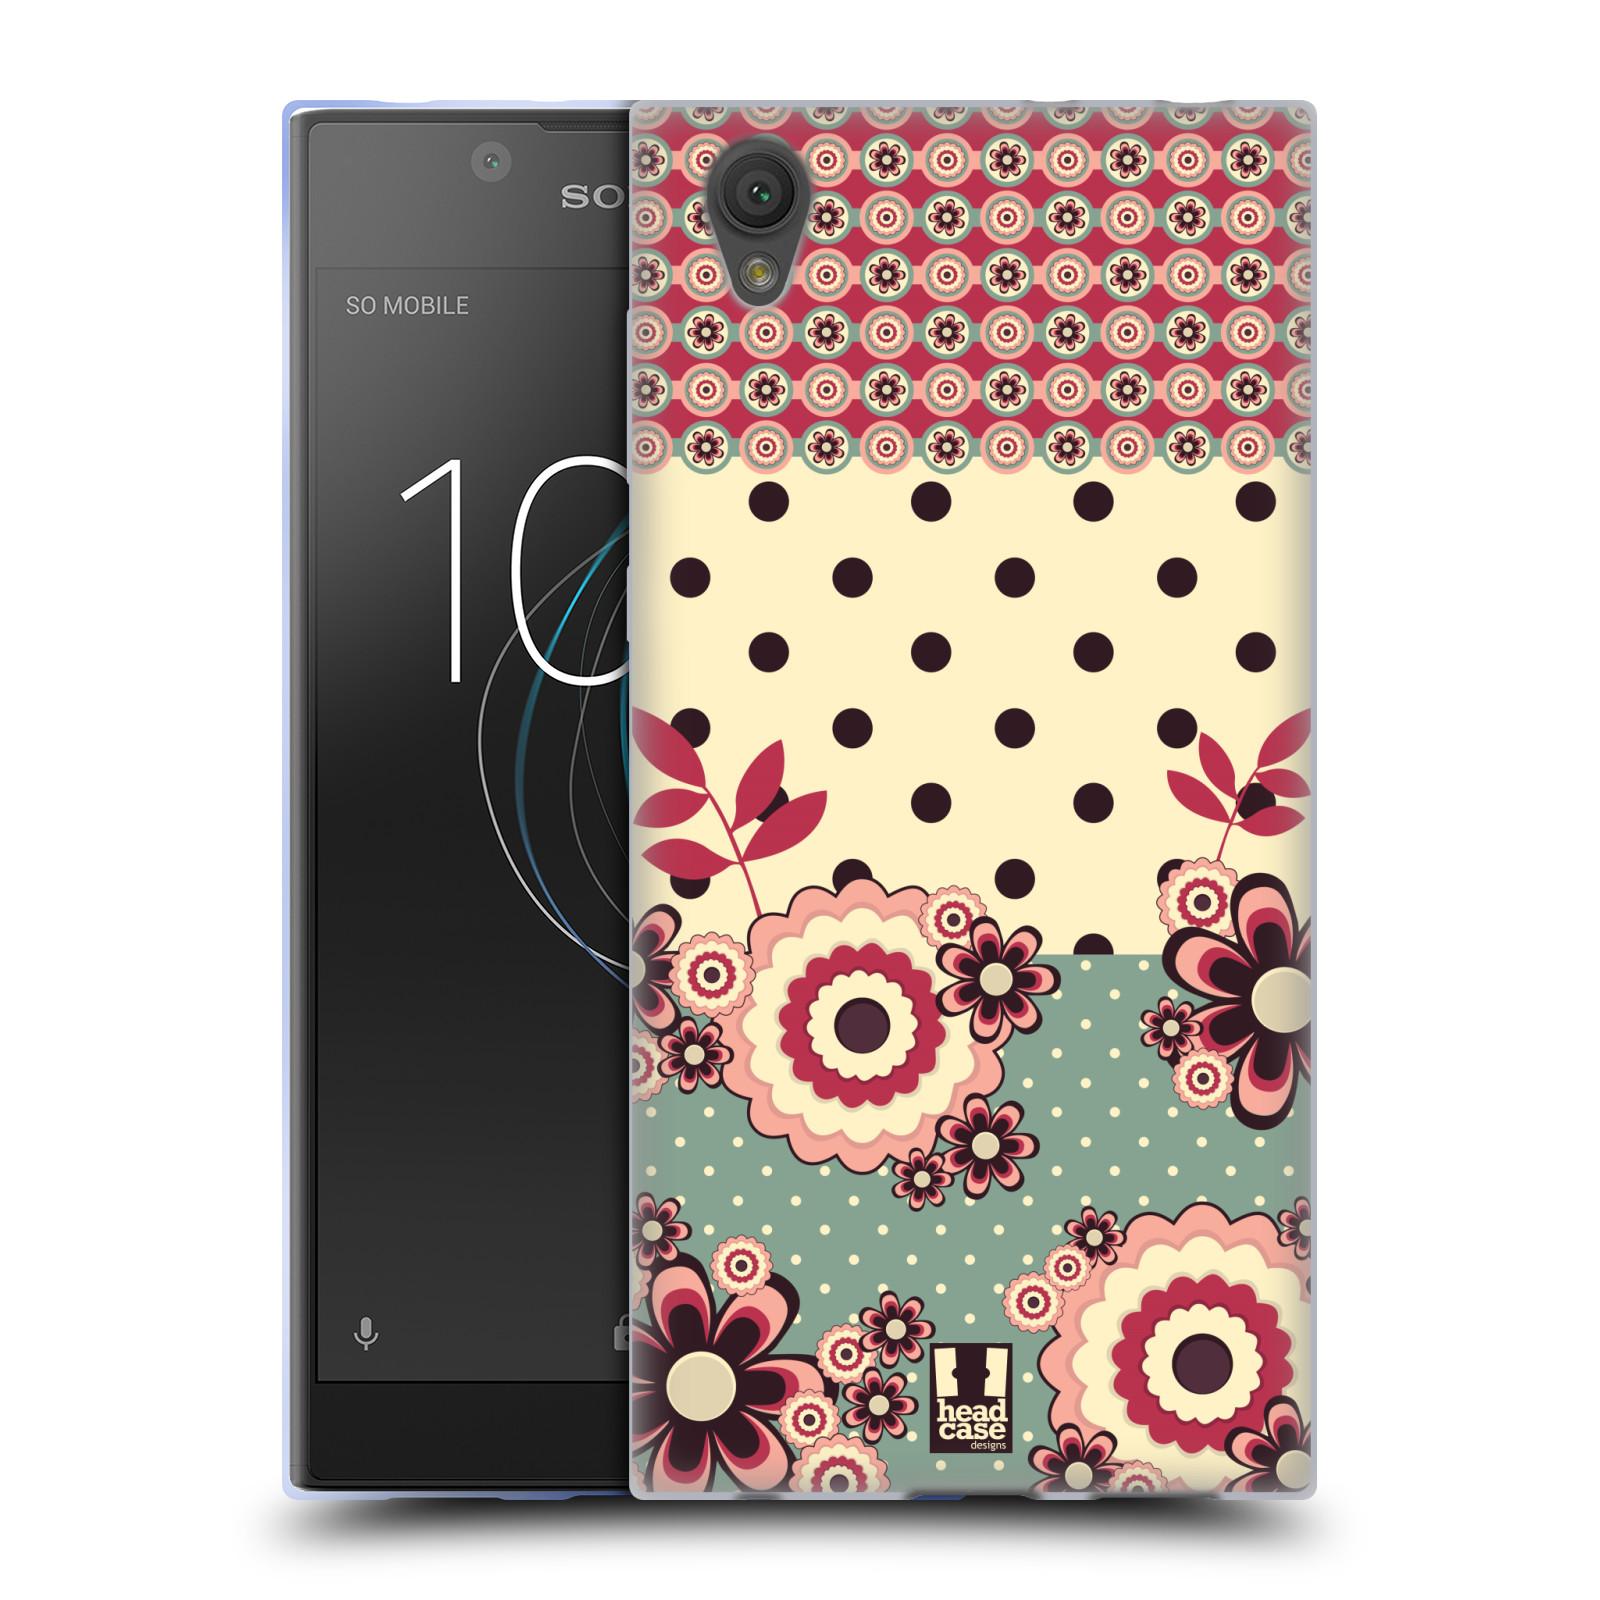 Silikonové pouzdro na mobil Sony Xperia L1 - Head Case - KVÍTKA PINK CREAM (Silikonový kryt či obal na mobilní telefon Sony Xperia L1 G3311 s motivem KVÍTKA PINK CREAM)